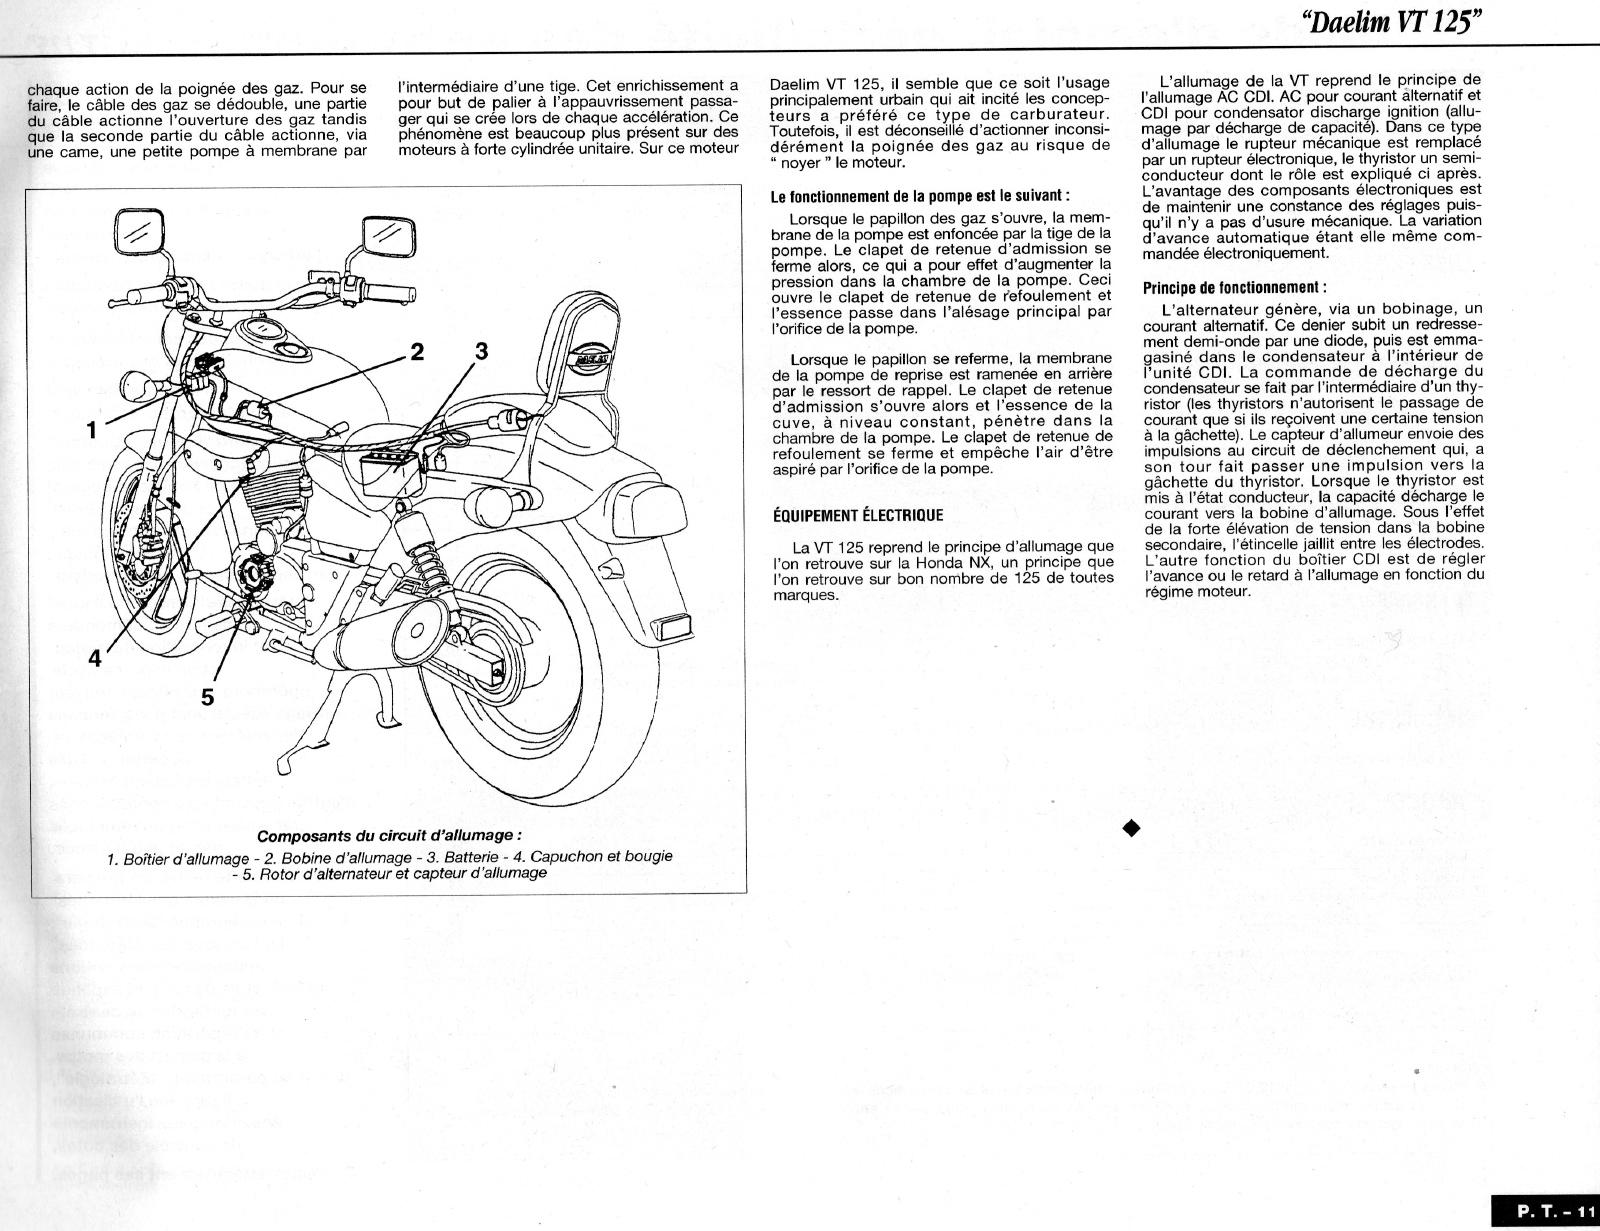 daelim-p10-particularités-techniques.jpg